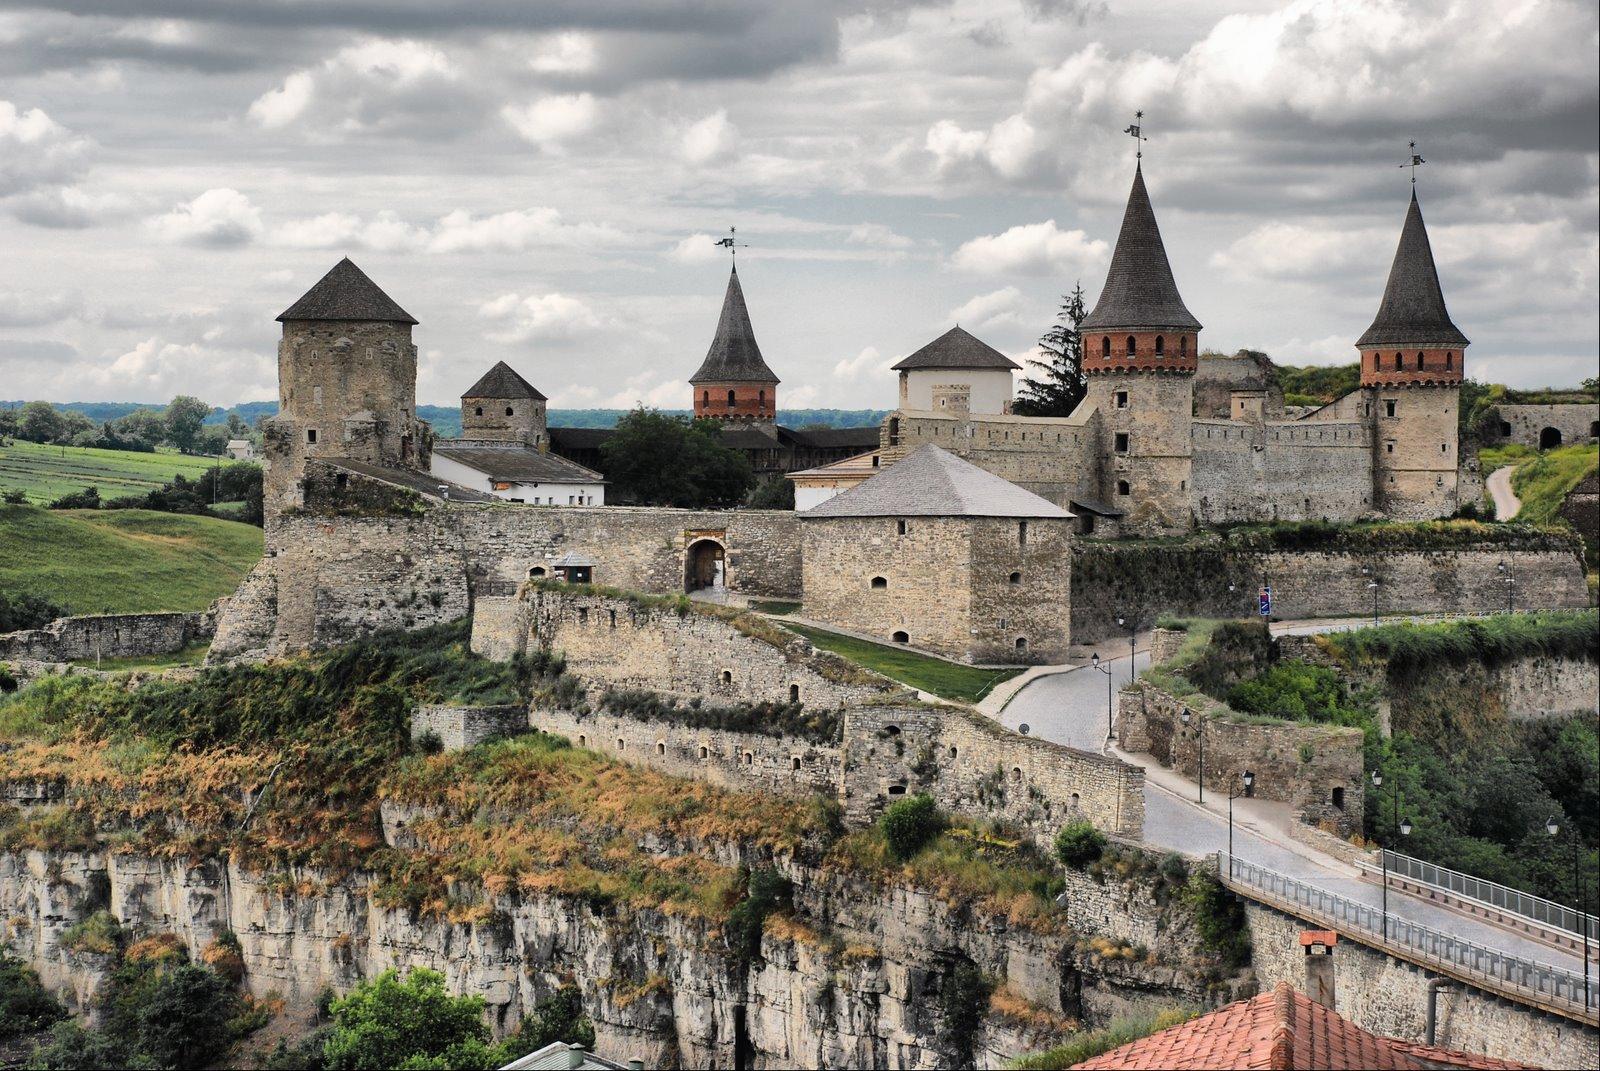 Castelo Kamianets-Podilskyi, símbolo do multiculturalismo do Leste Europeu (Foto: Ukraine Incognita)